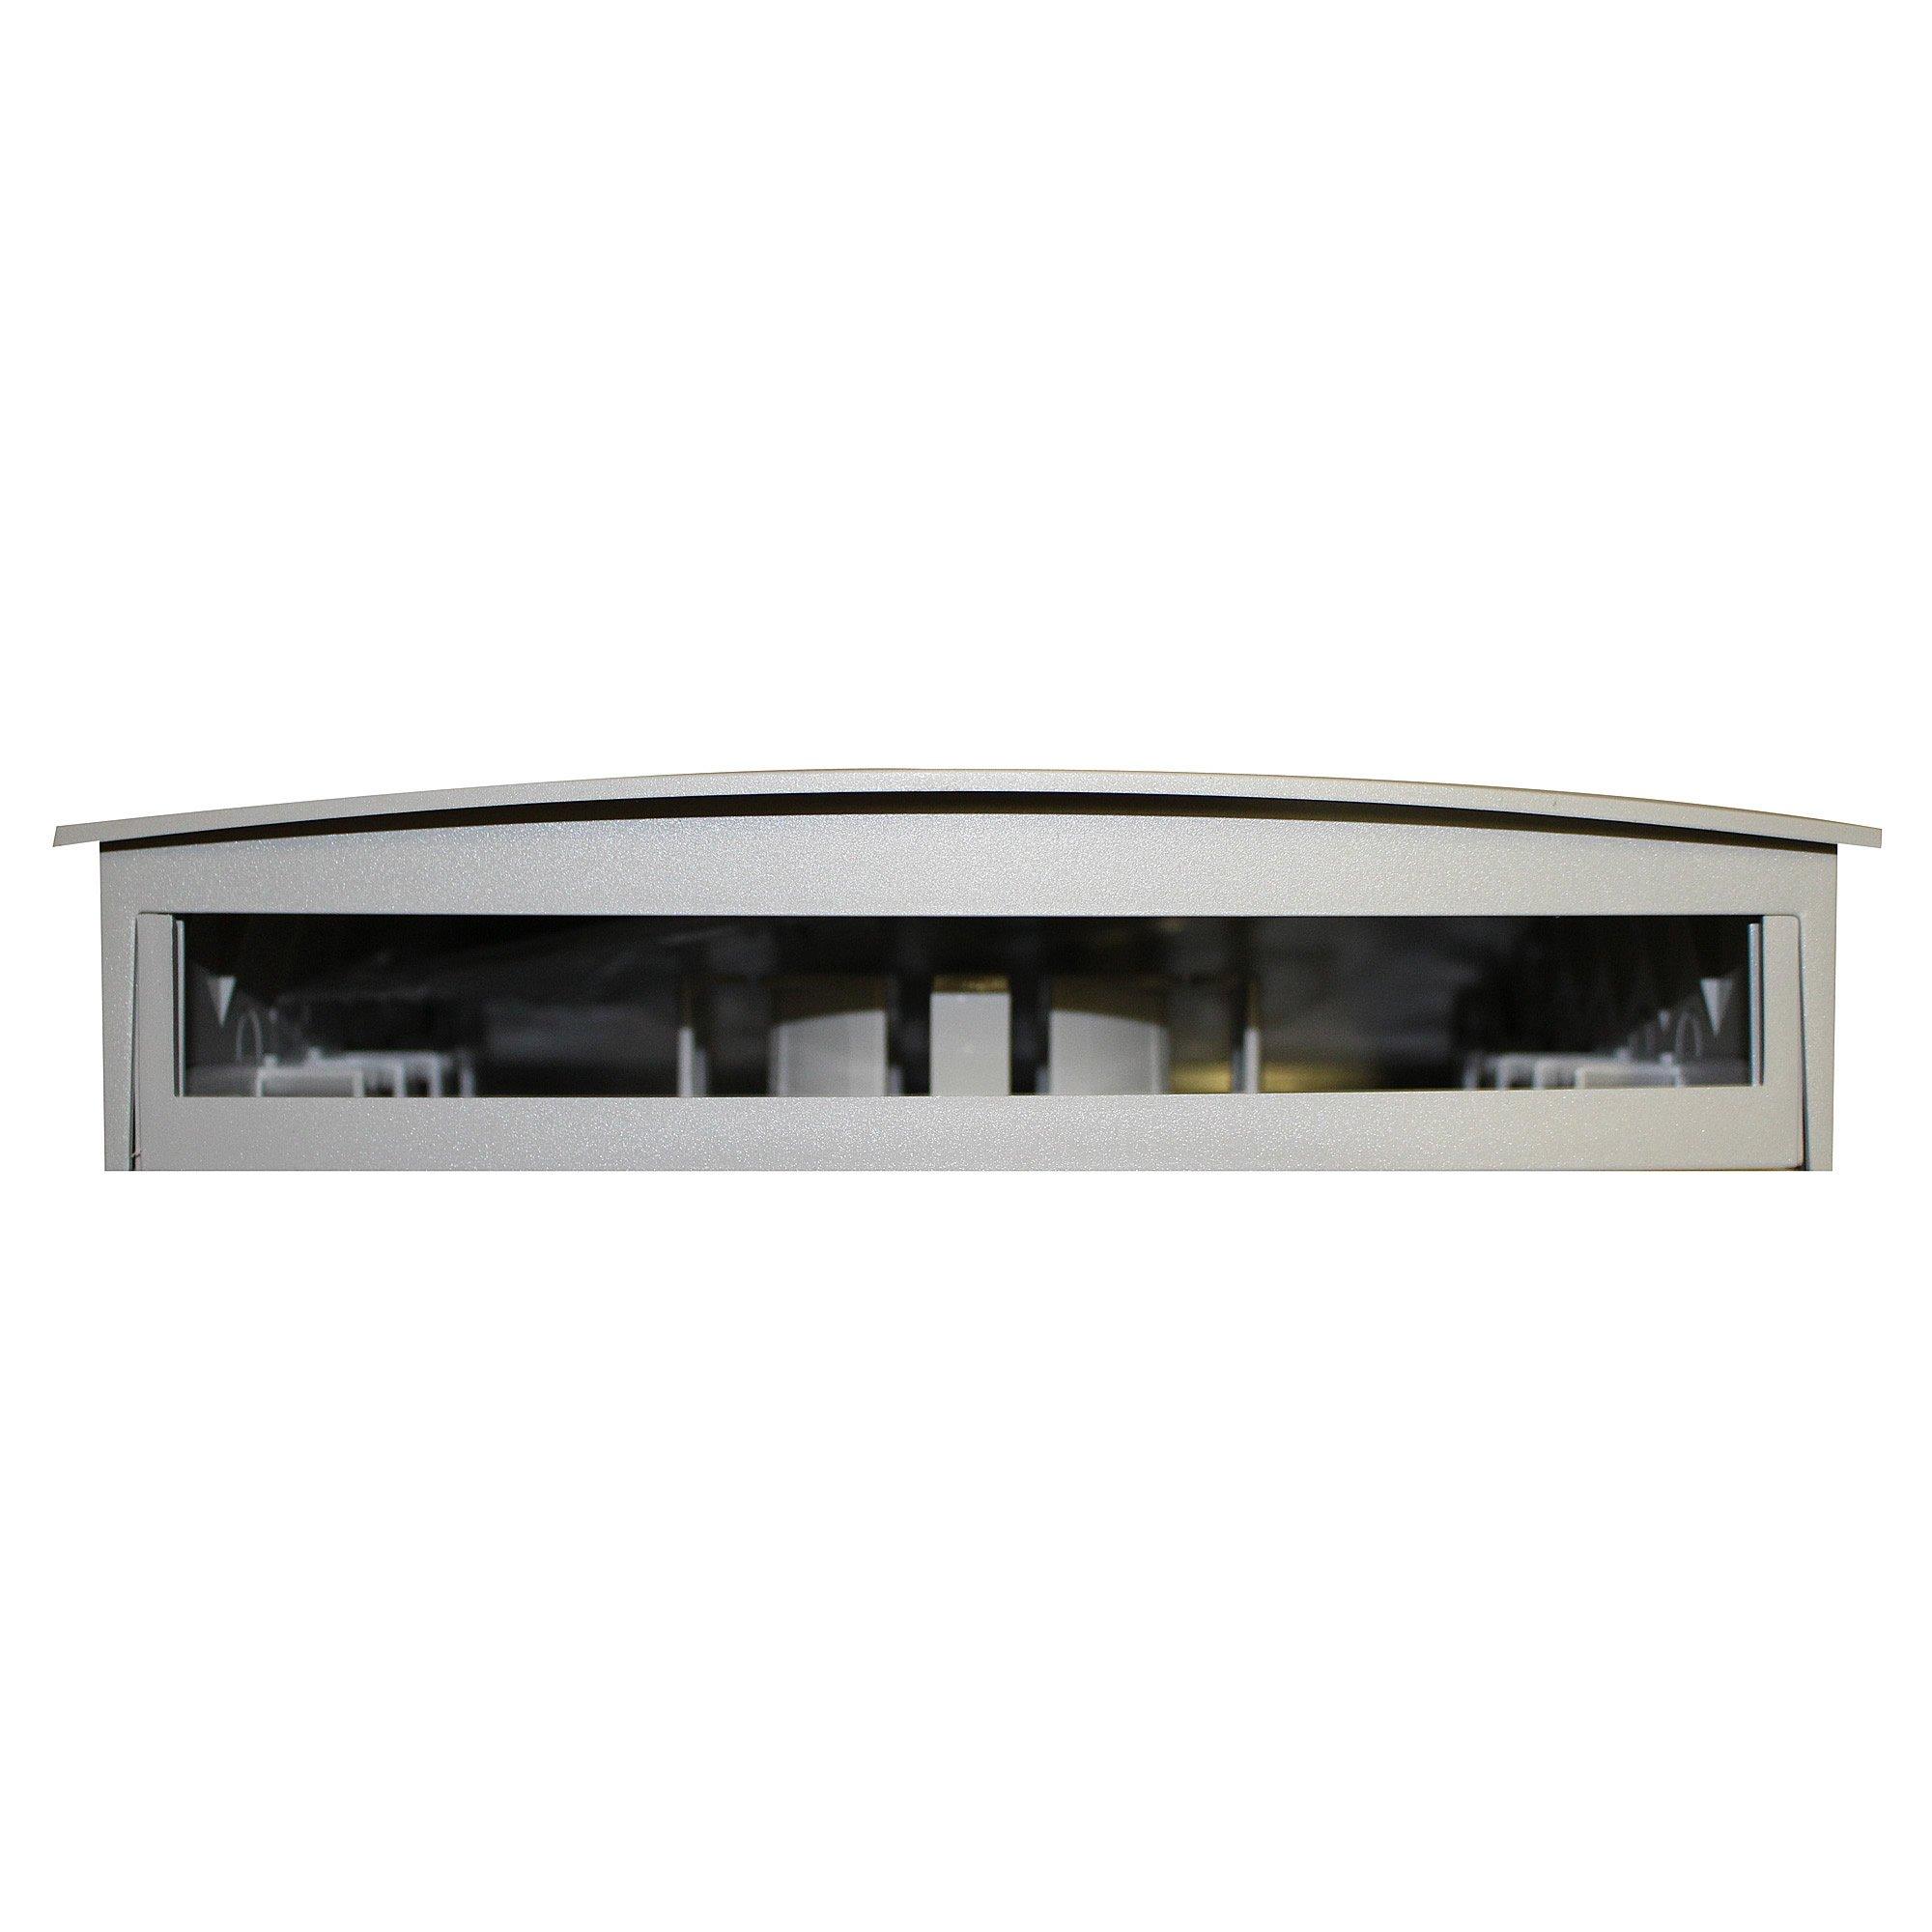 Belden AX100219 MDVO Multi Media Outlet Box, 24 Port, Gray Finish